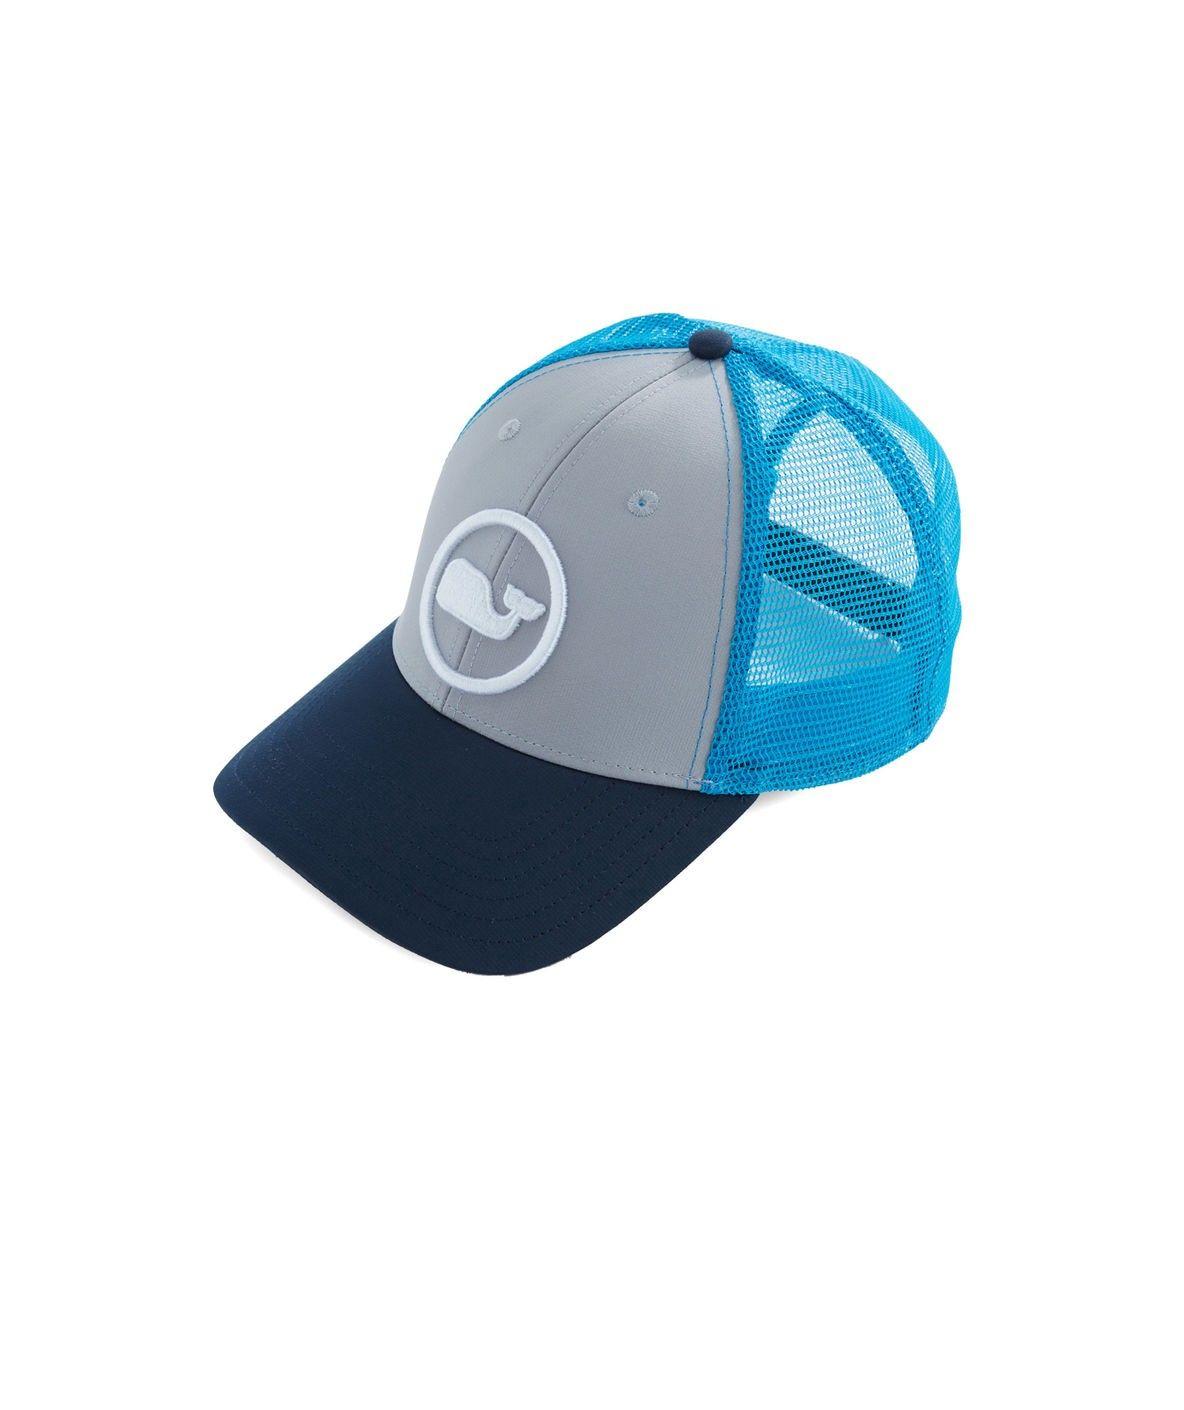 Vineyard Vines Whale Dot Performance Trucker Hat - Caribbean Green 1Sz b385fb65230